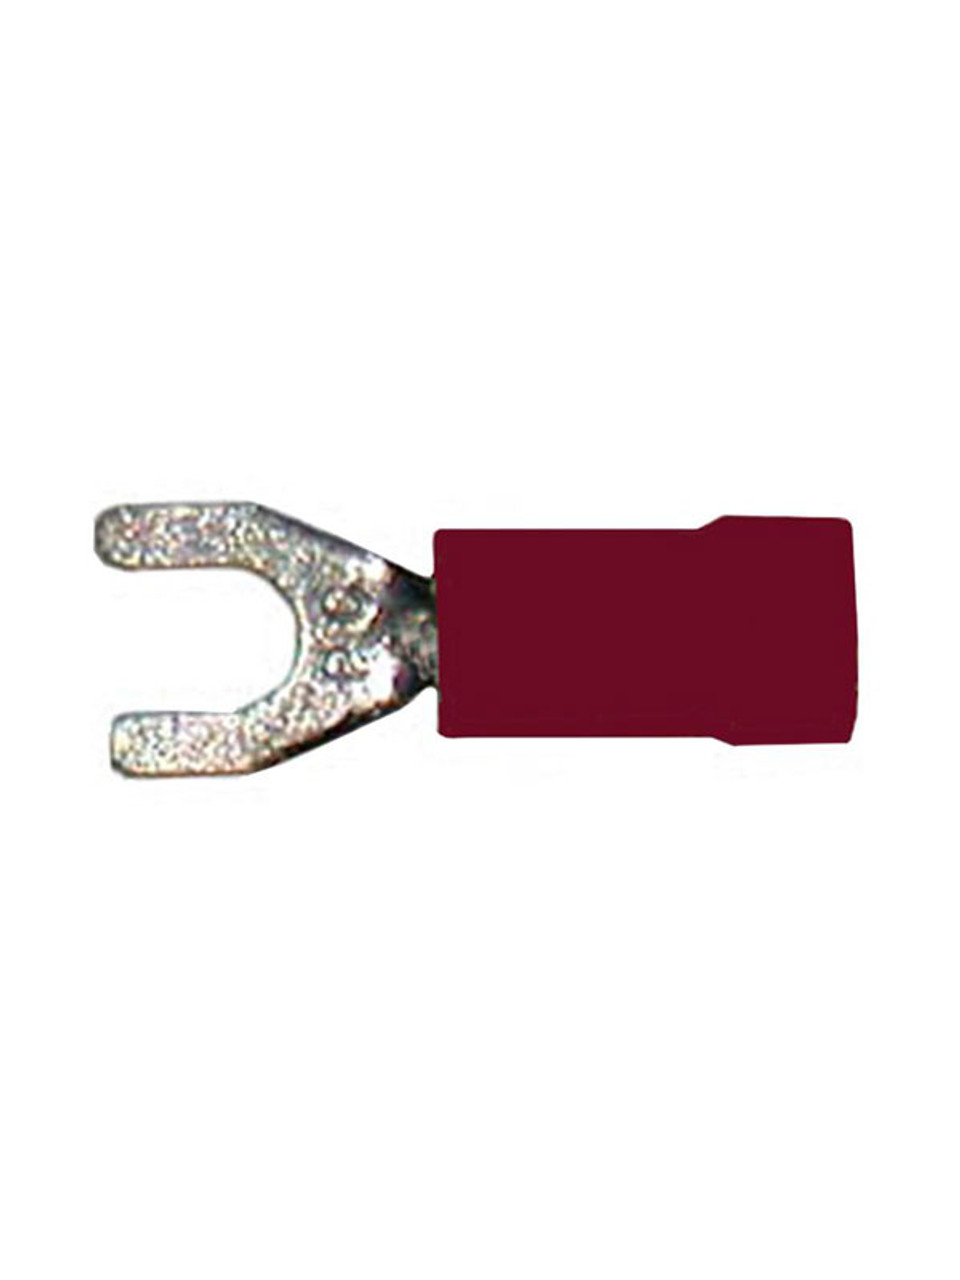 RS-8 --- Red Spade # 8 Terminal